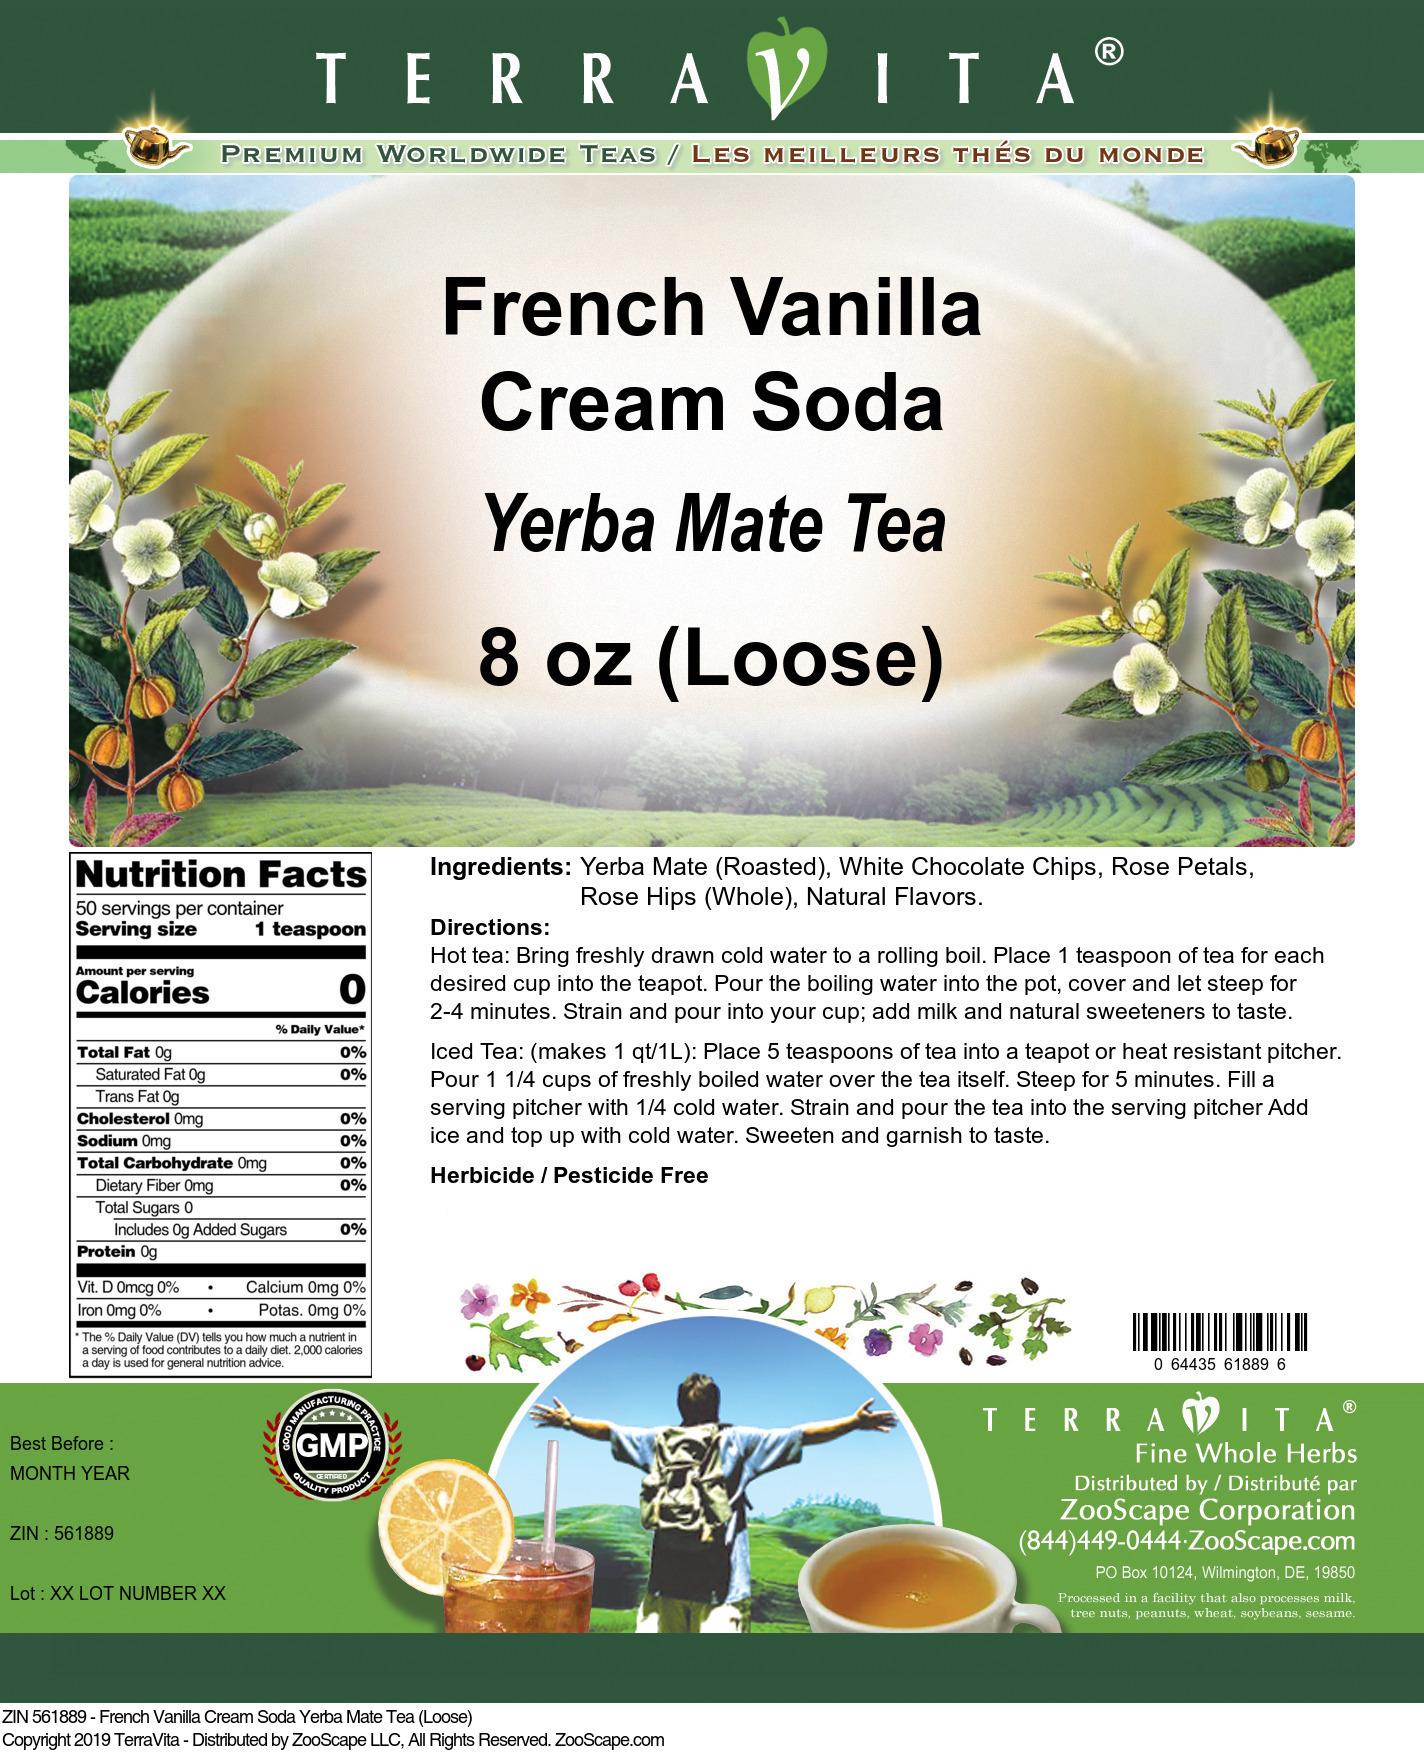 French Vanilla Cream Soda Yerba Mate Tea (Loose)